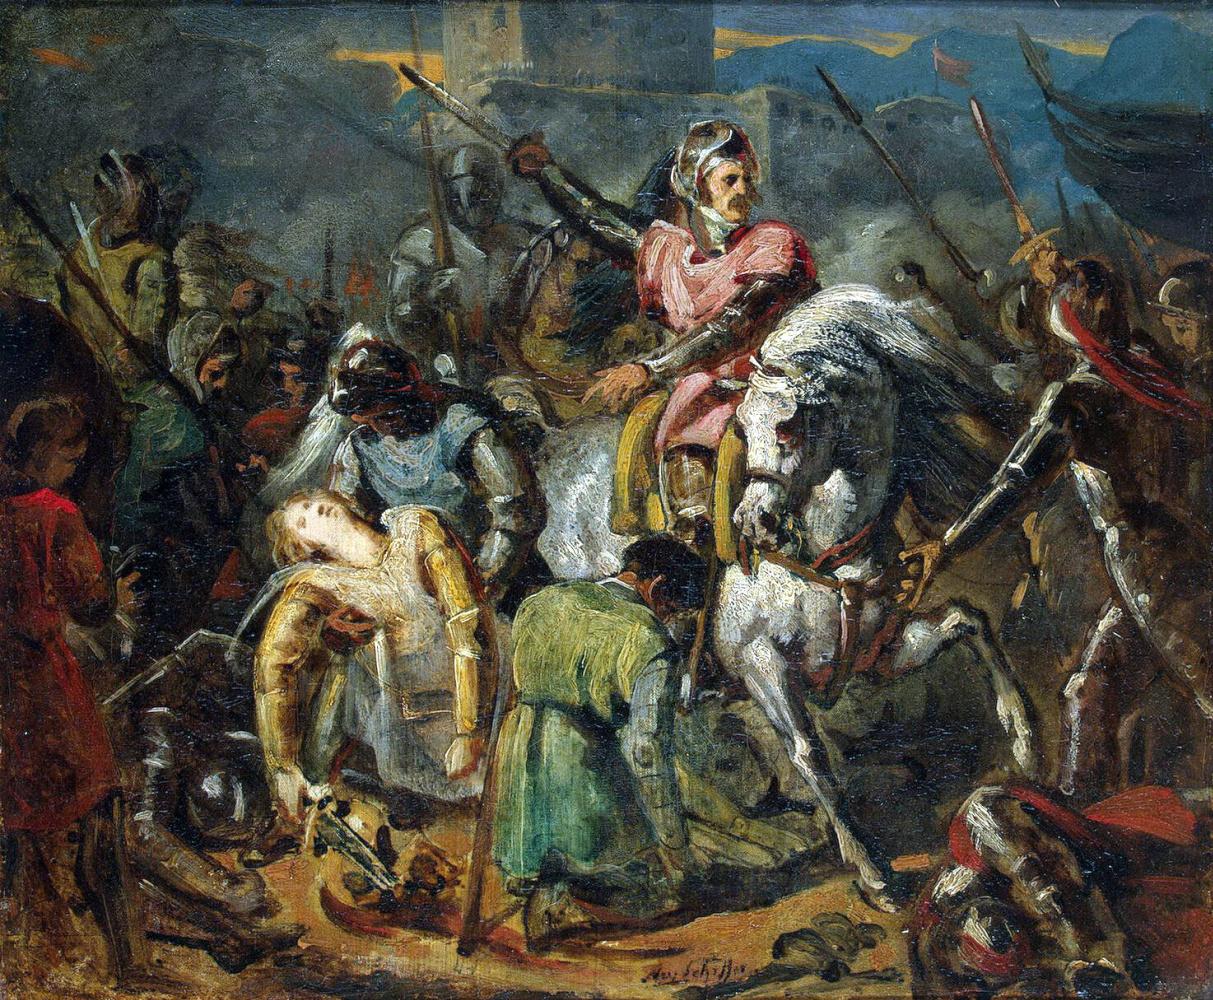 Ари Схеффер. Смерть Гастона де Фуа в битве при Равенне